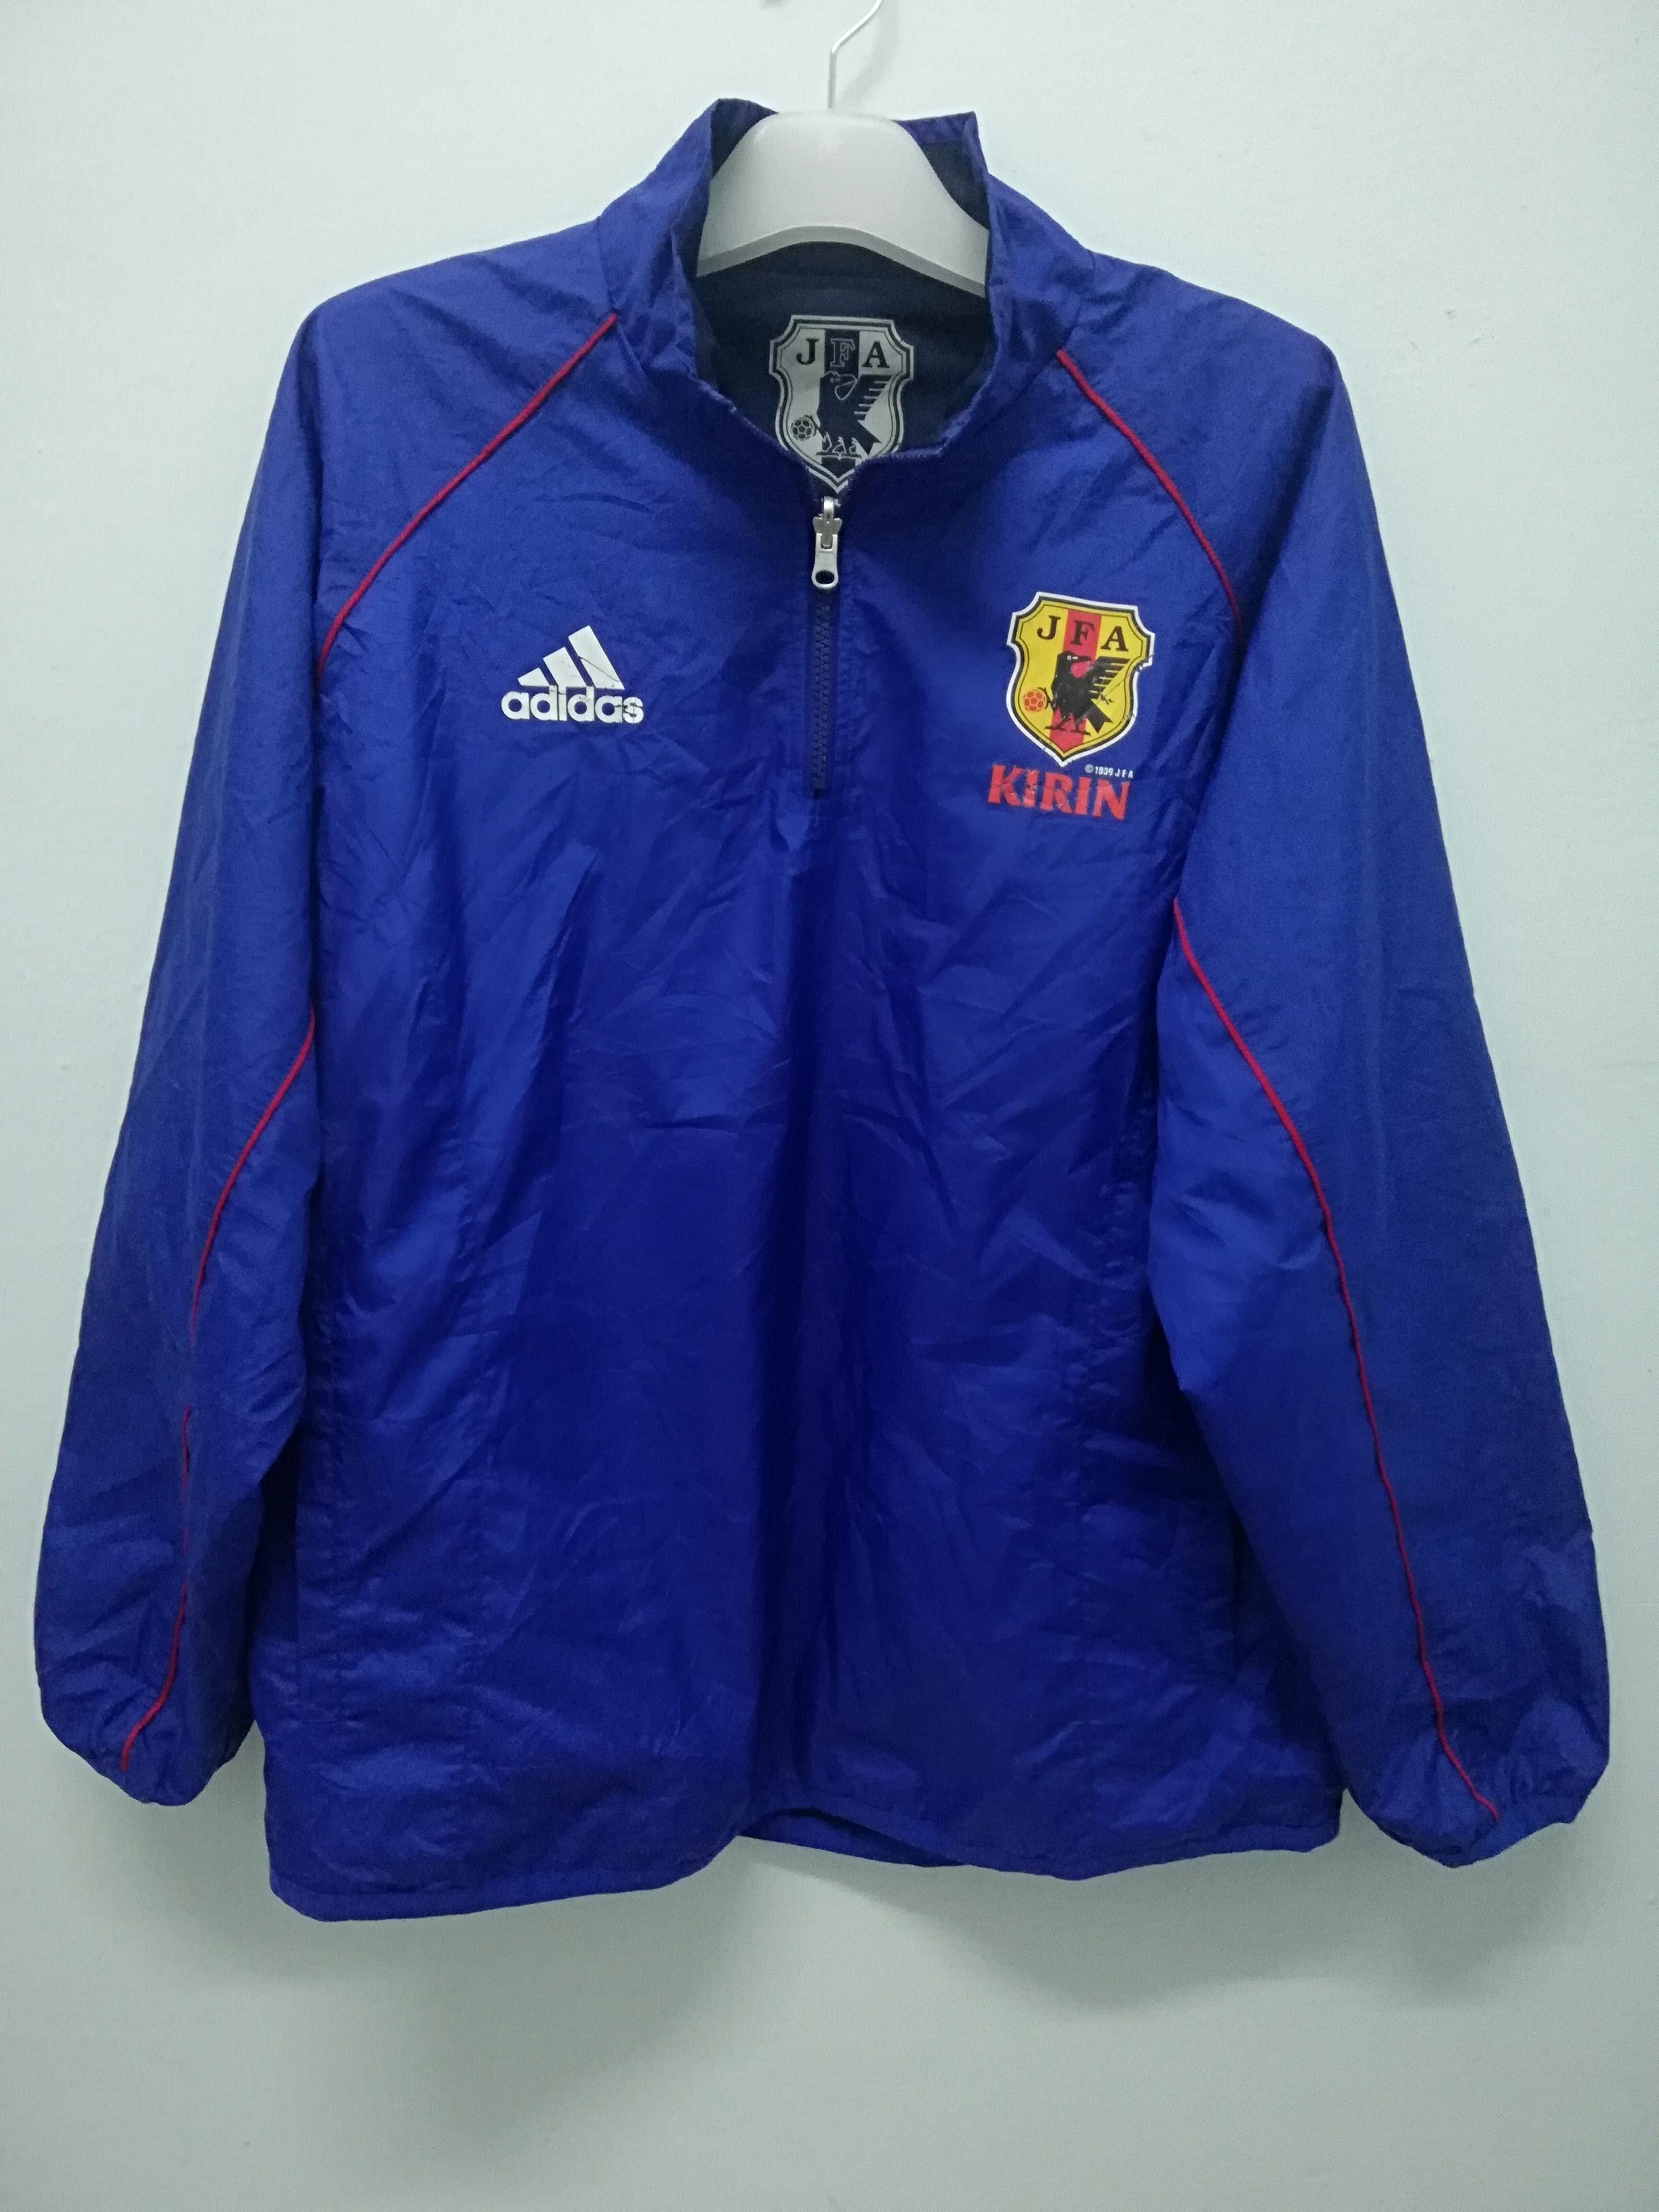 Vintage Japan Jersey JFA jacket